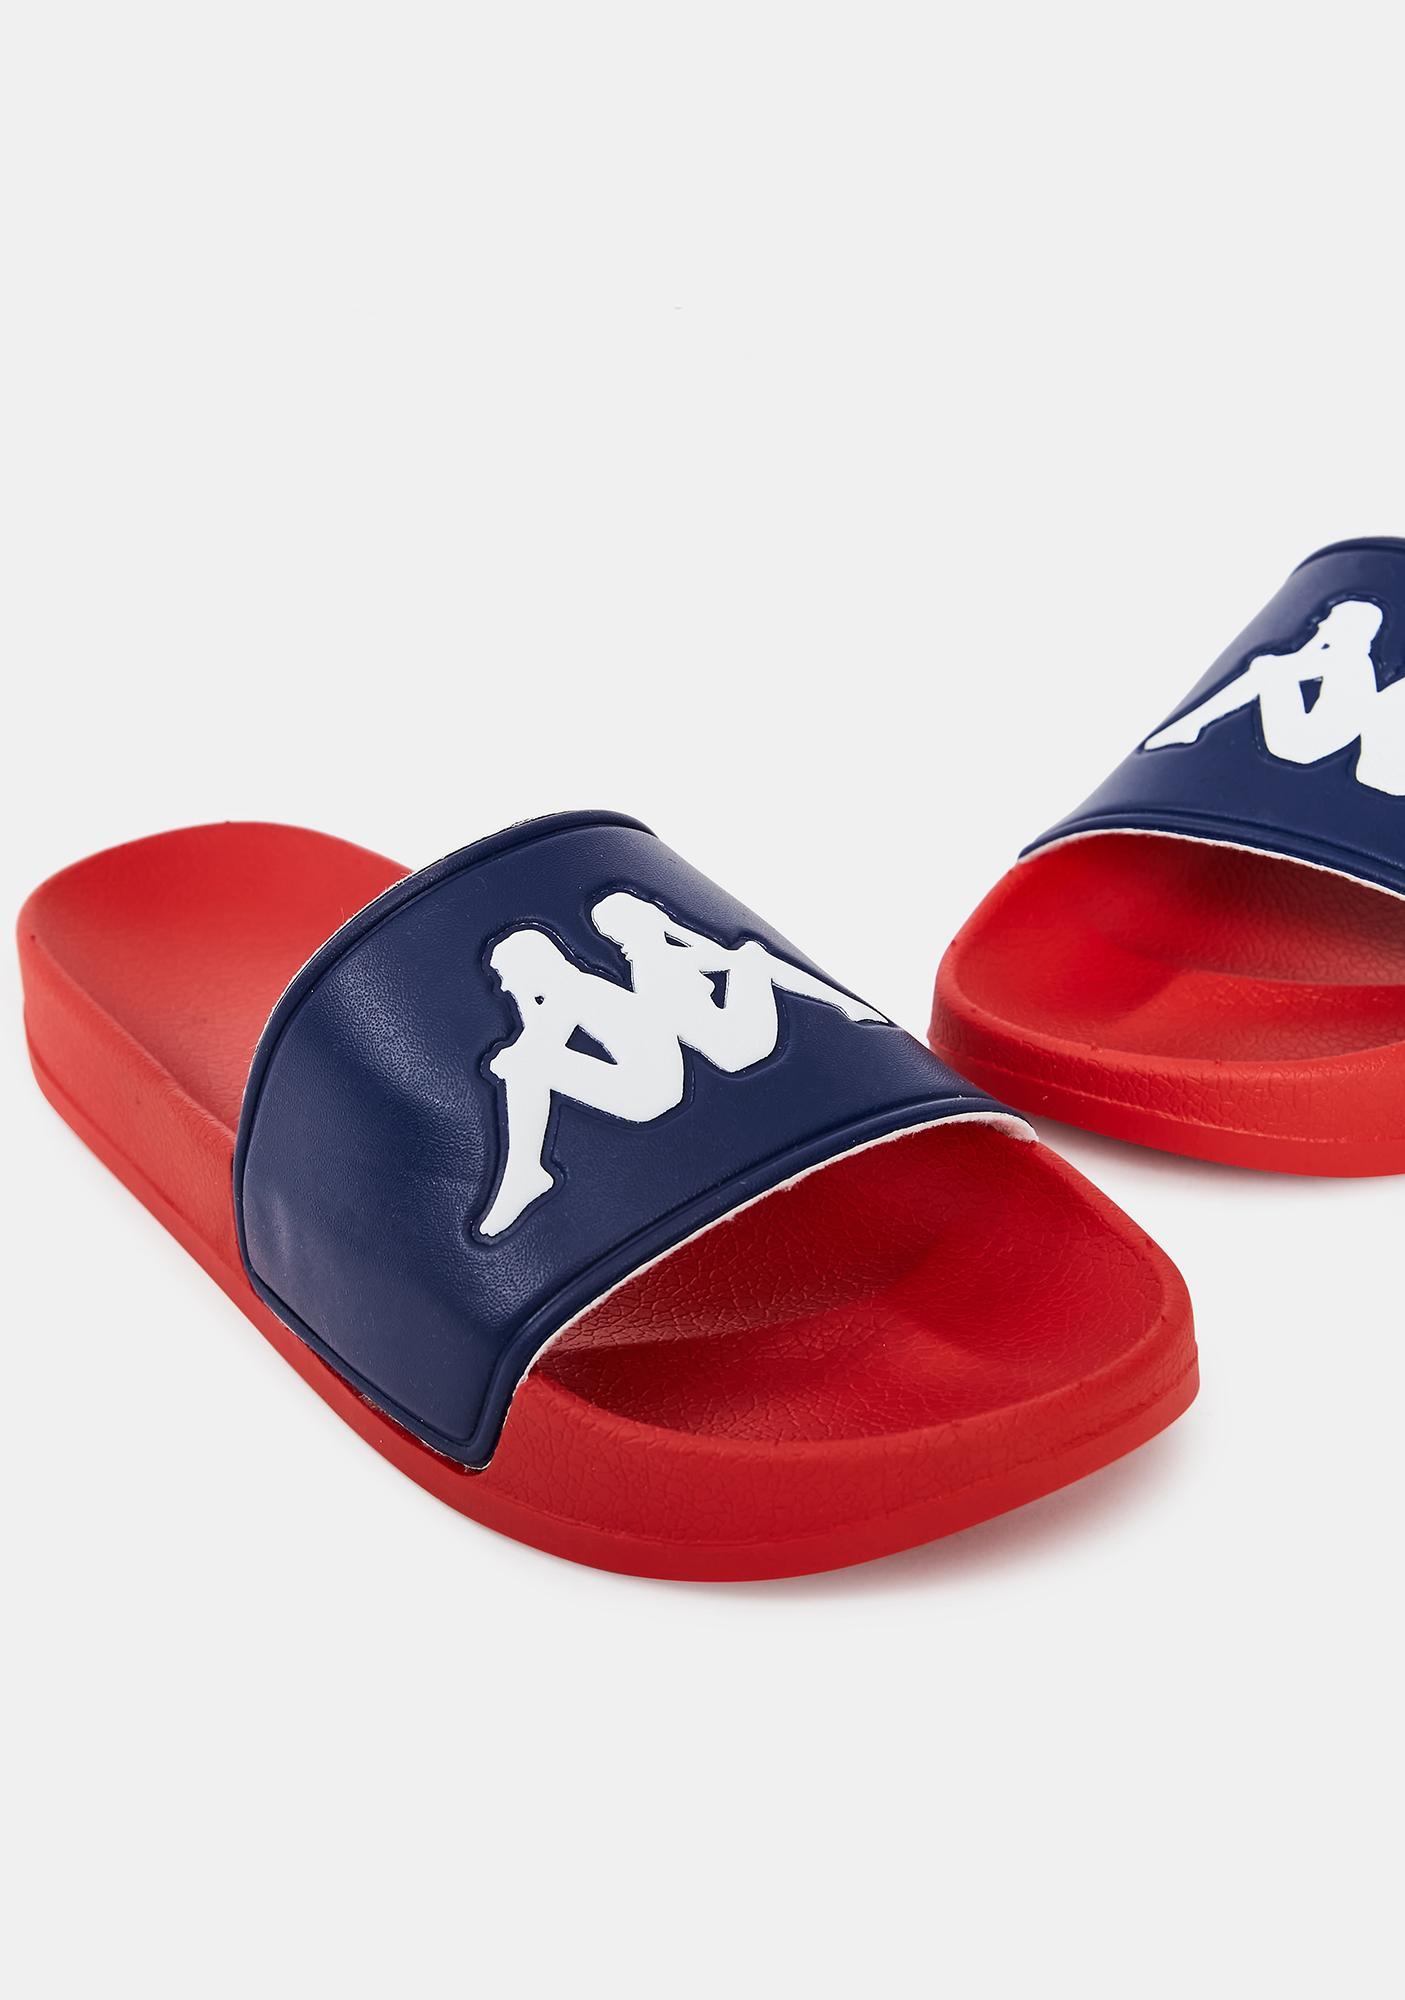 Kappa Blue Red Authentic Adam 2 Slides